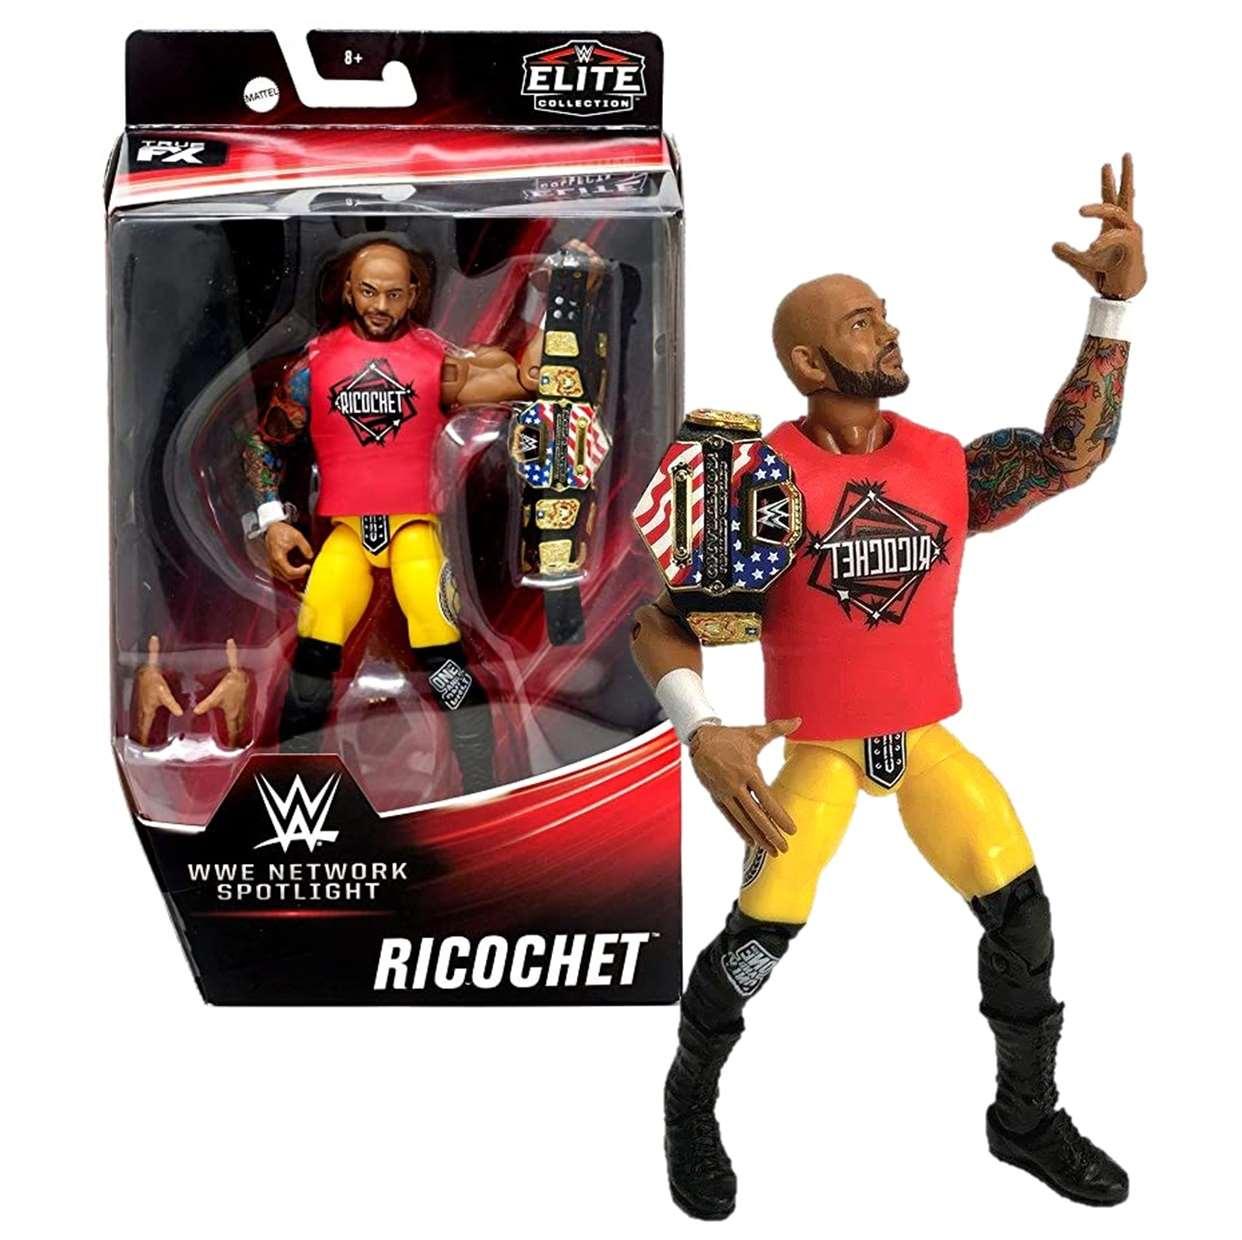 Ricochet Figura Wwe Elite Collection Network Spotligh